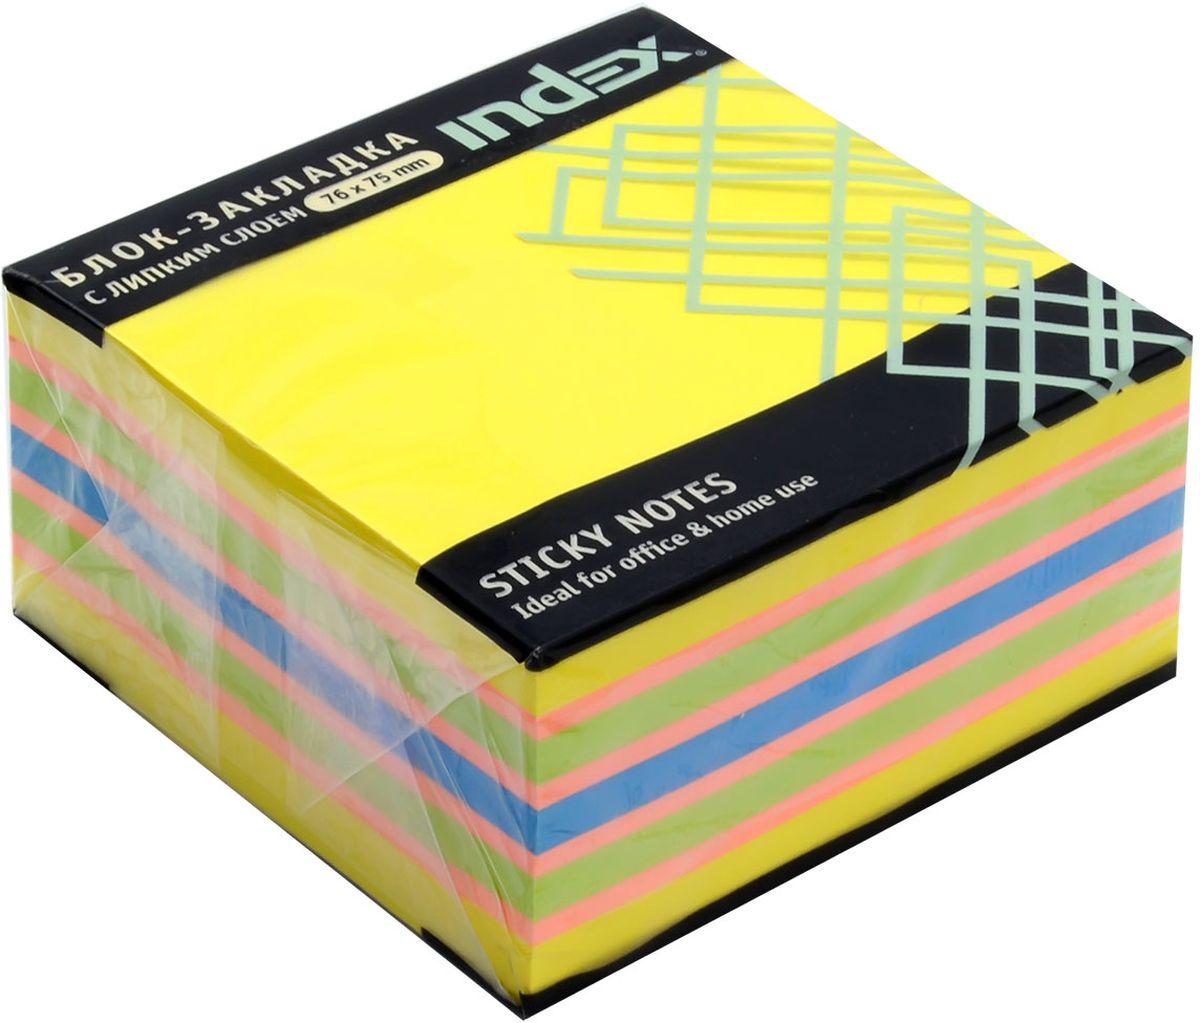 Index Бумага для заметок с липким слоем 7,6 х 7,5 см цвет желтый 400 листов I433812 бумага с липким слоем 3m 90 листов 51х76 мм желтый 656 s